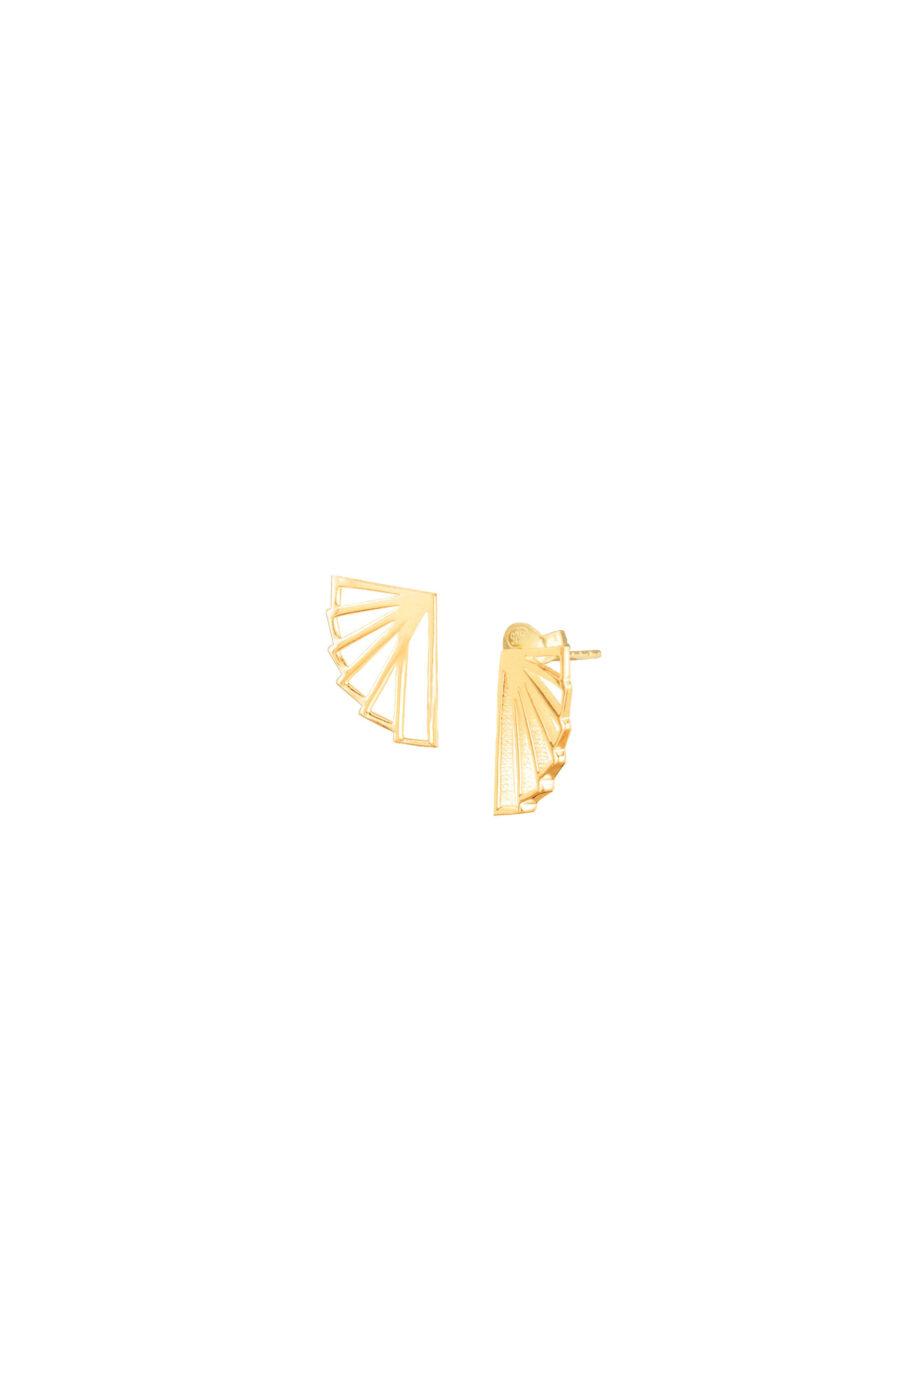 Oorbellen duurzaam_Fan Stud goud_Protsaah_heel